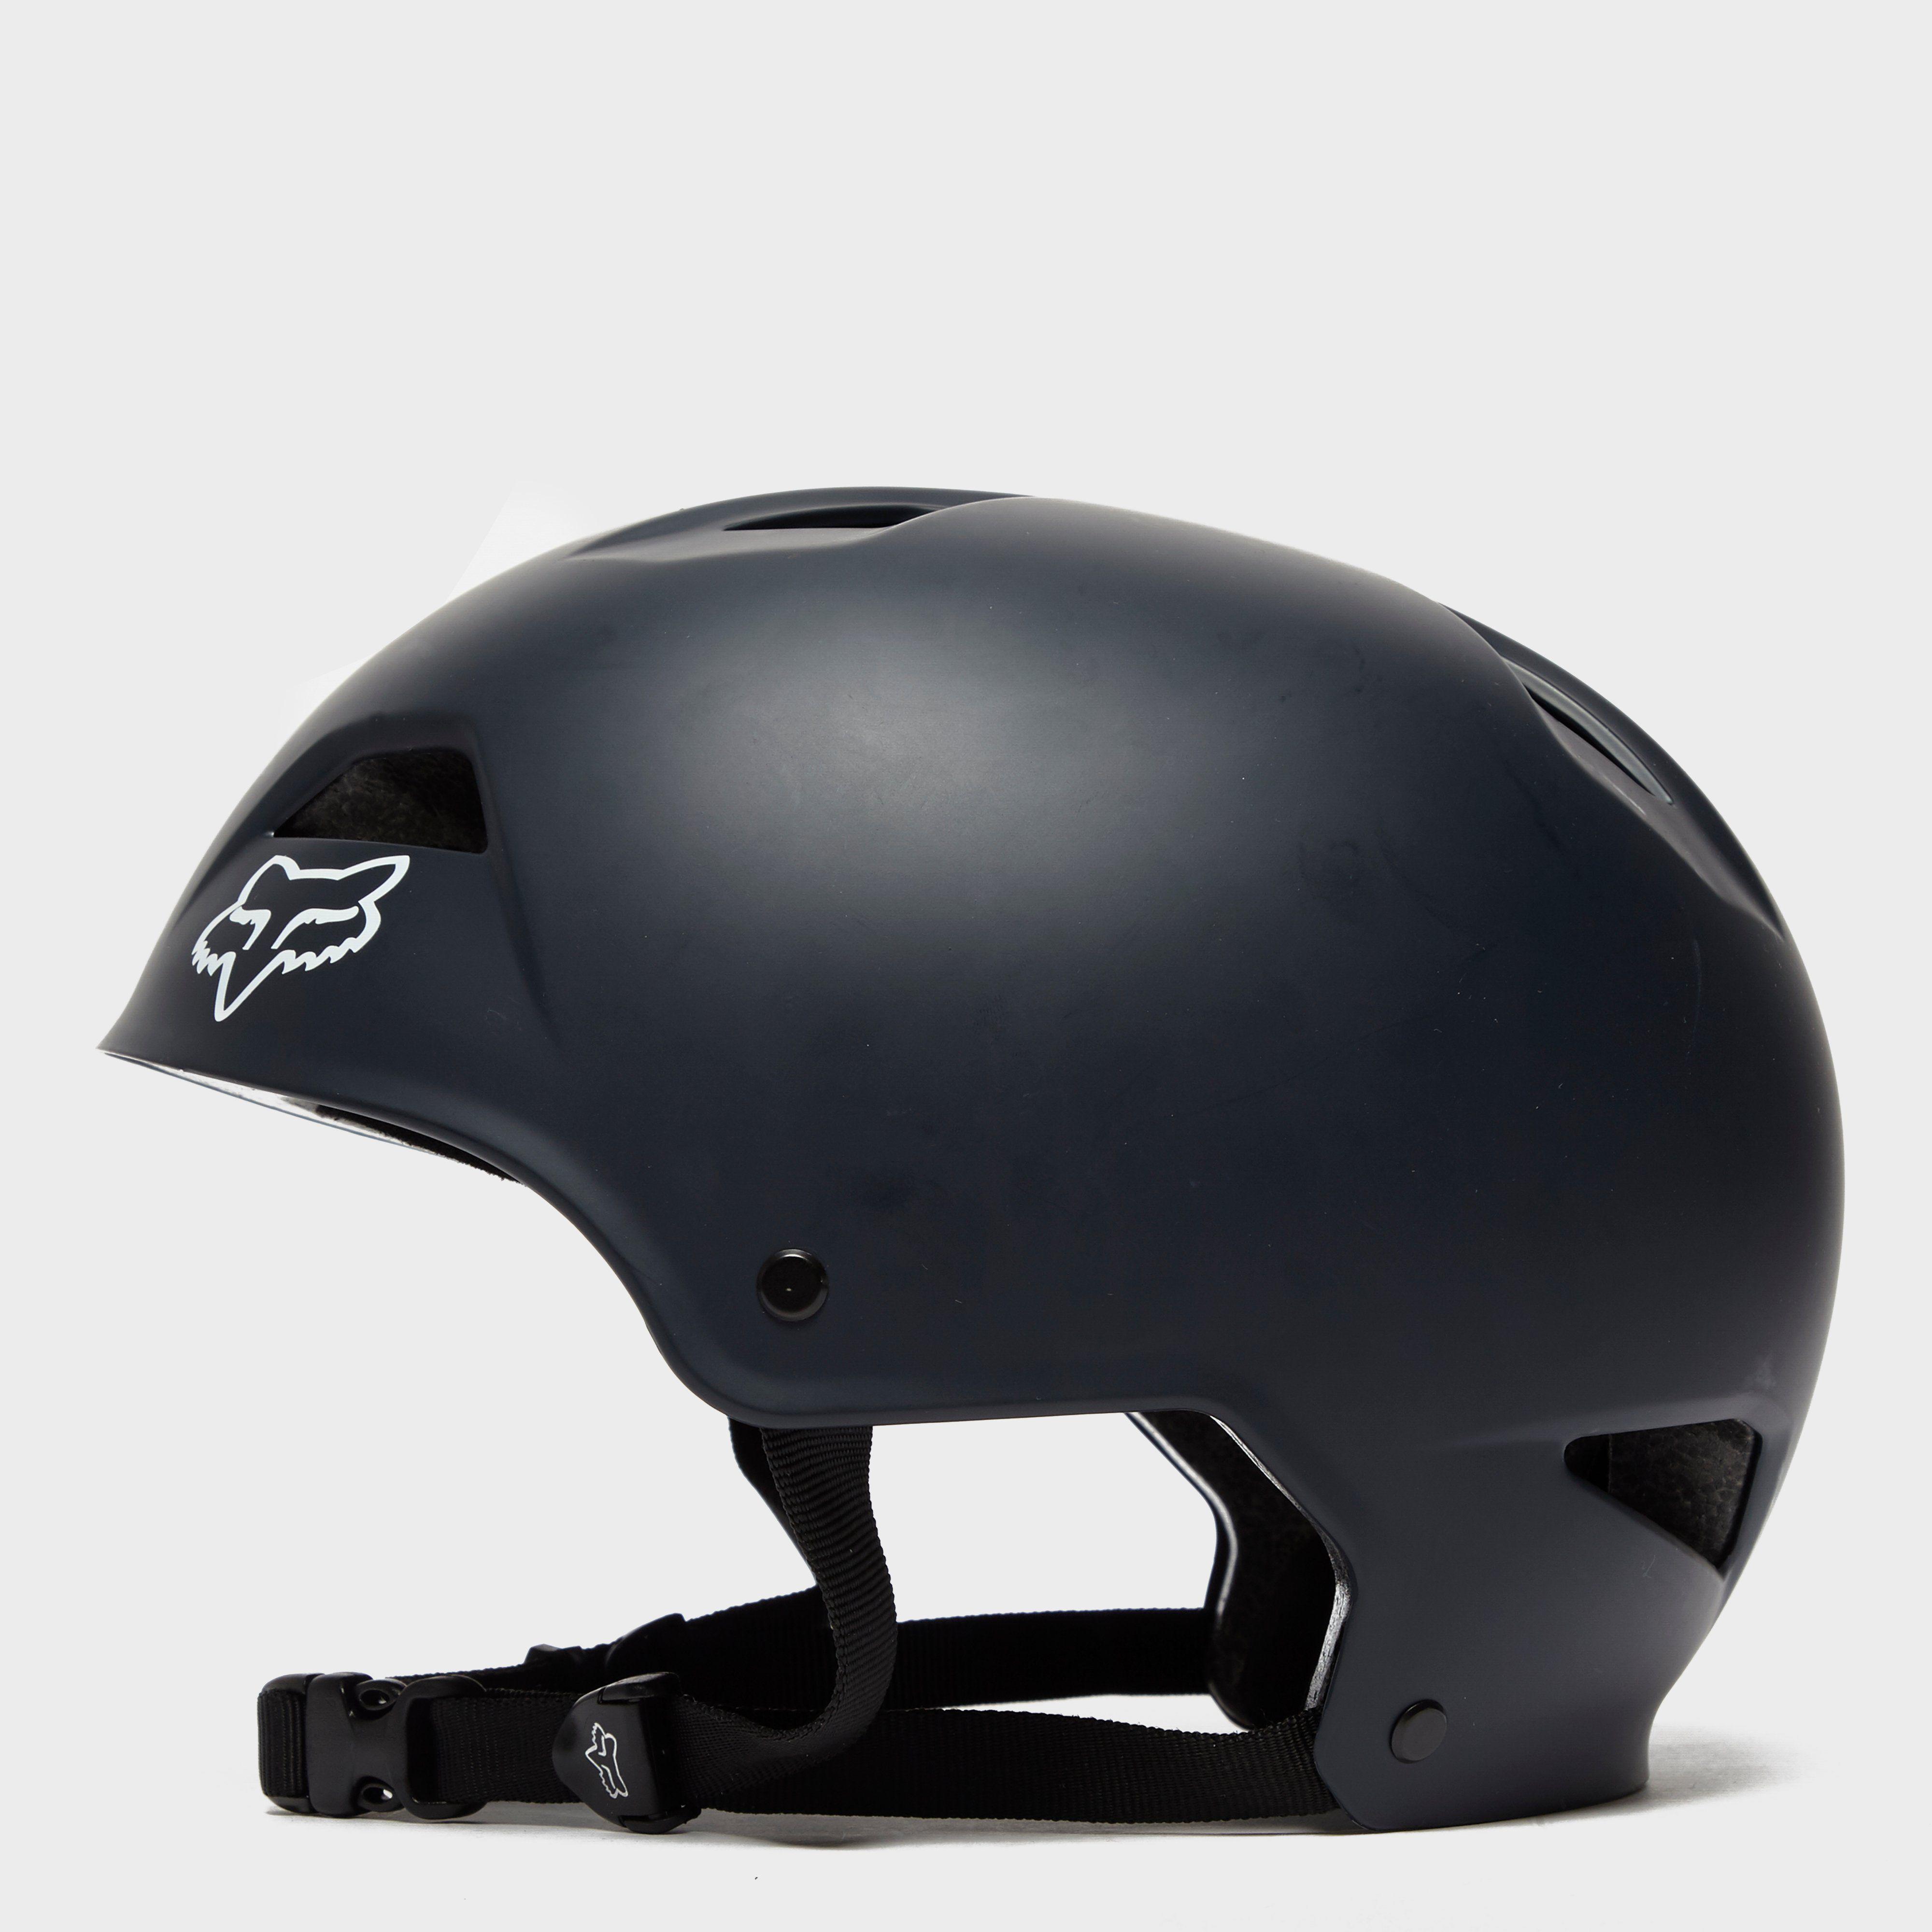 FOX HEAD Flight Sport BMX Helmet